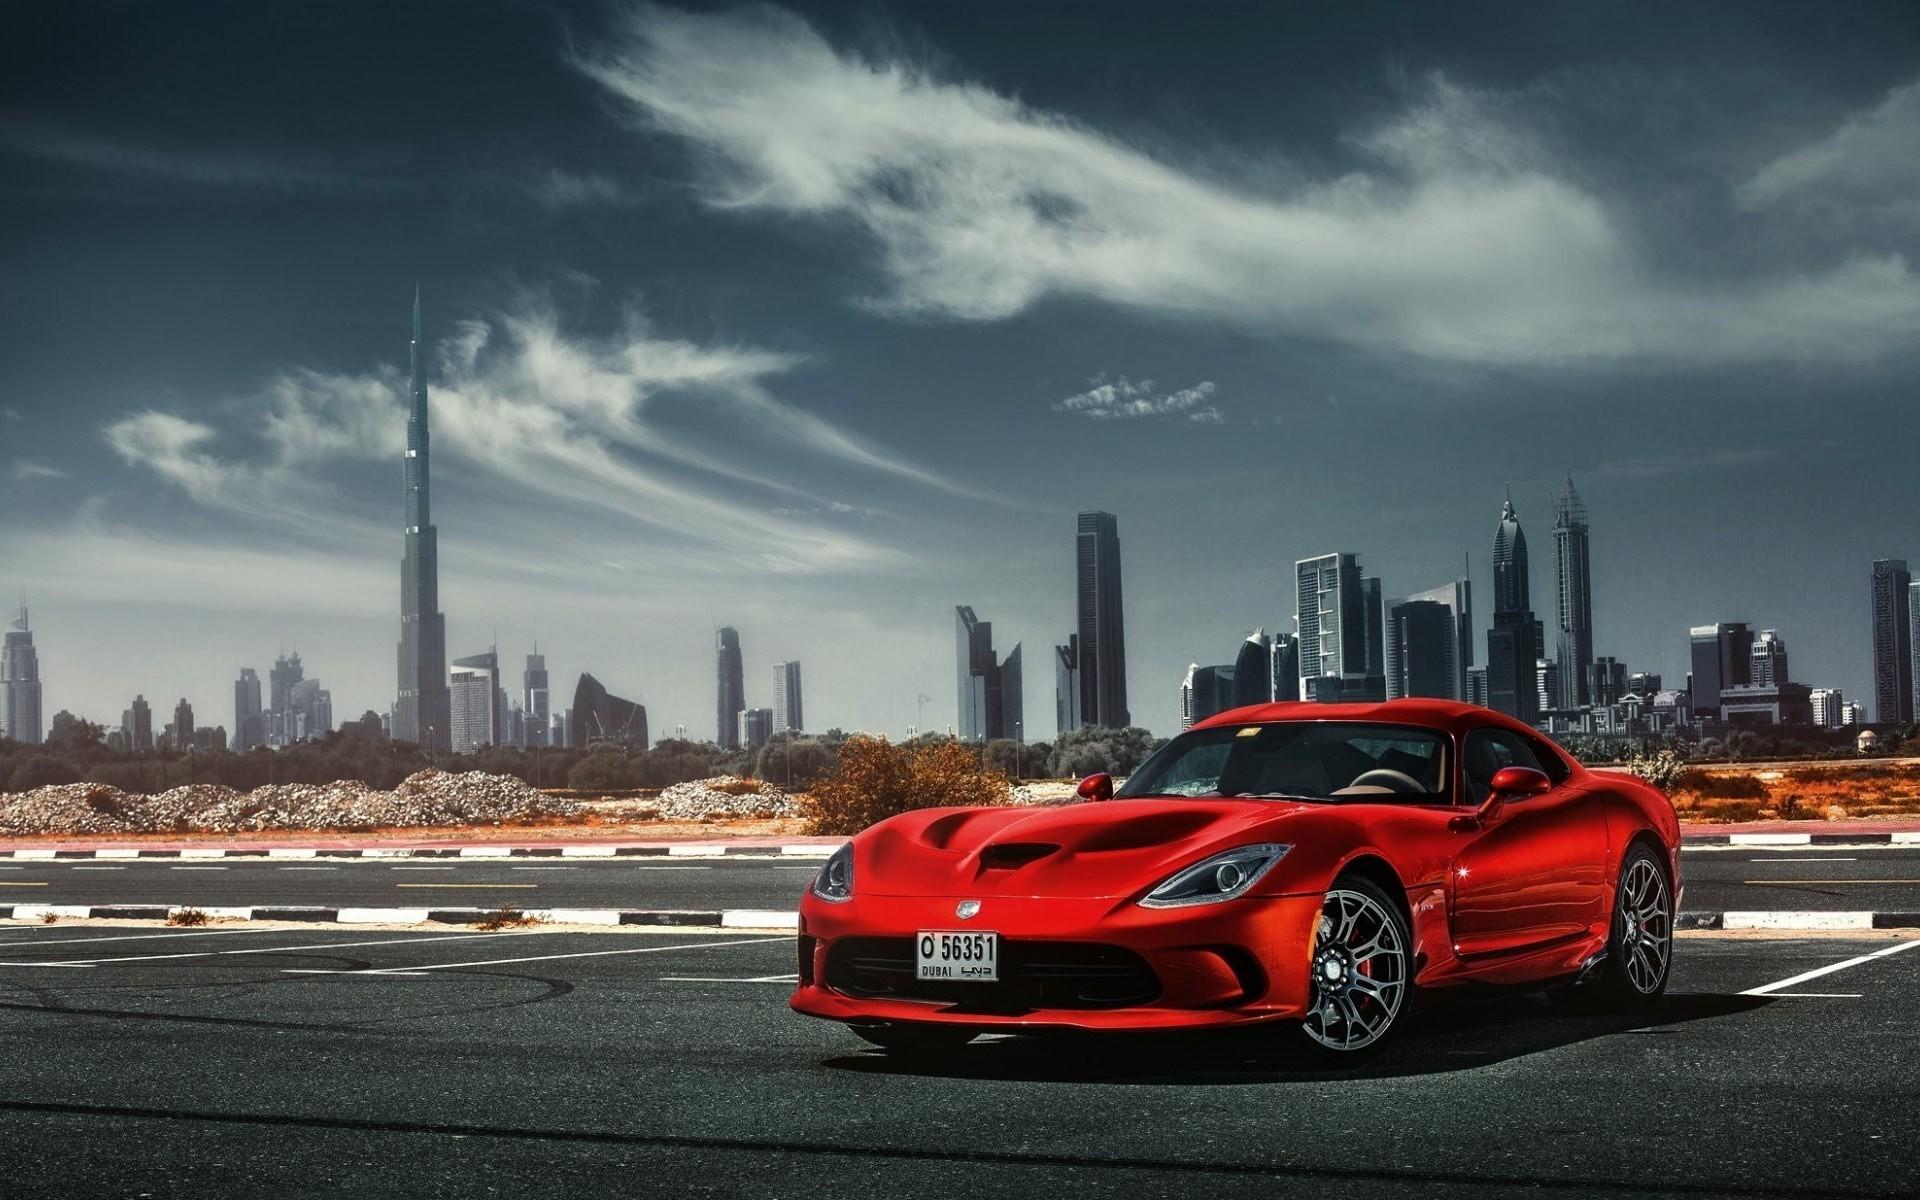 dodge viper gen 5 buyers guide review exotic car hacks rh exoticcarhacks com used dodge viper buyers guide Audi R8